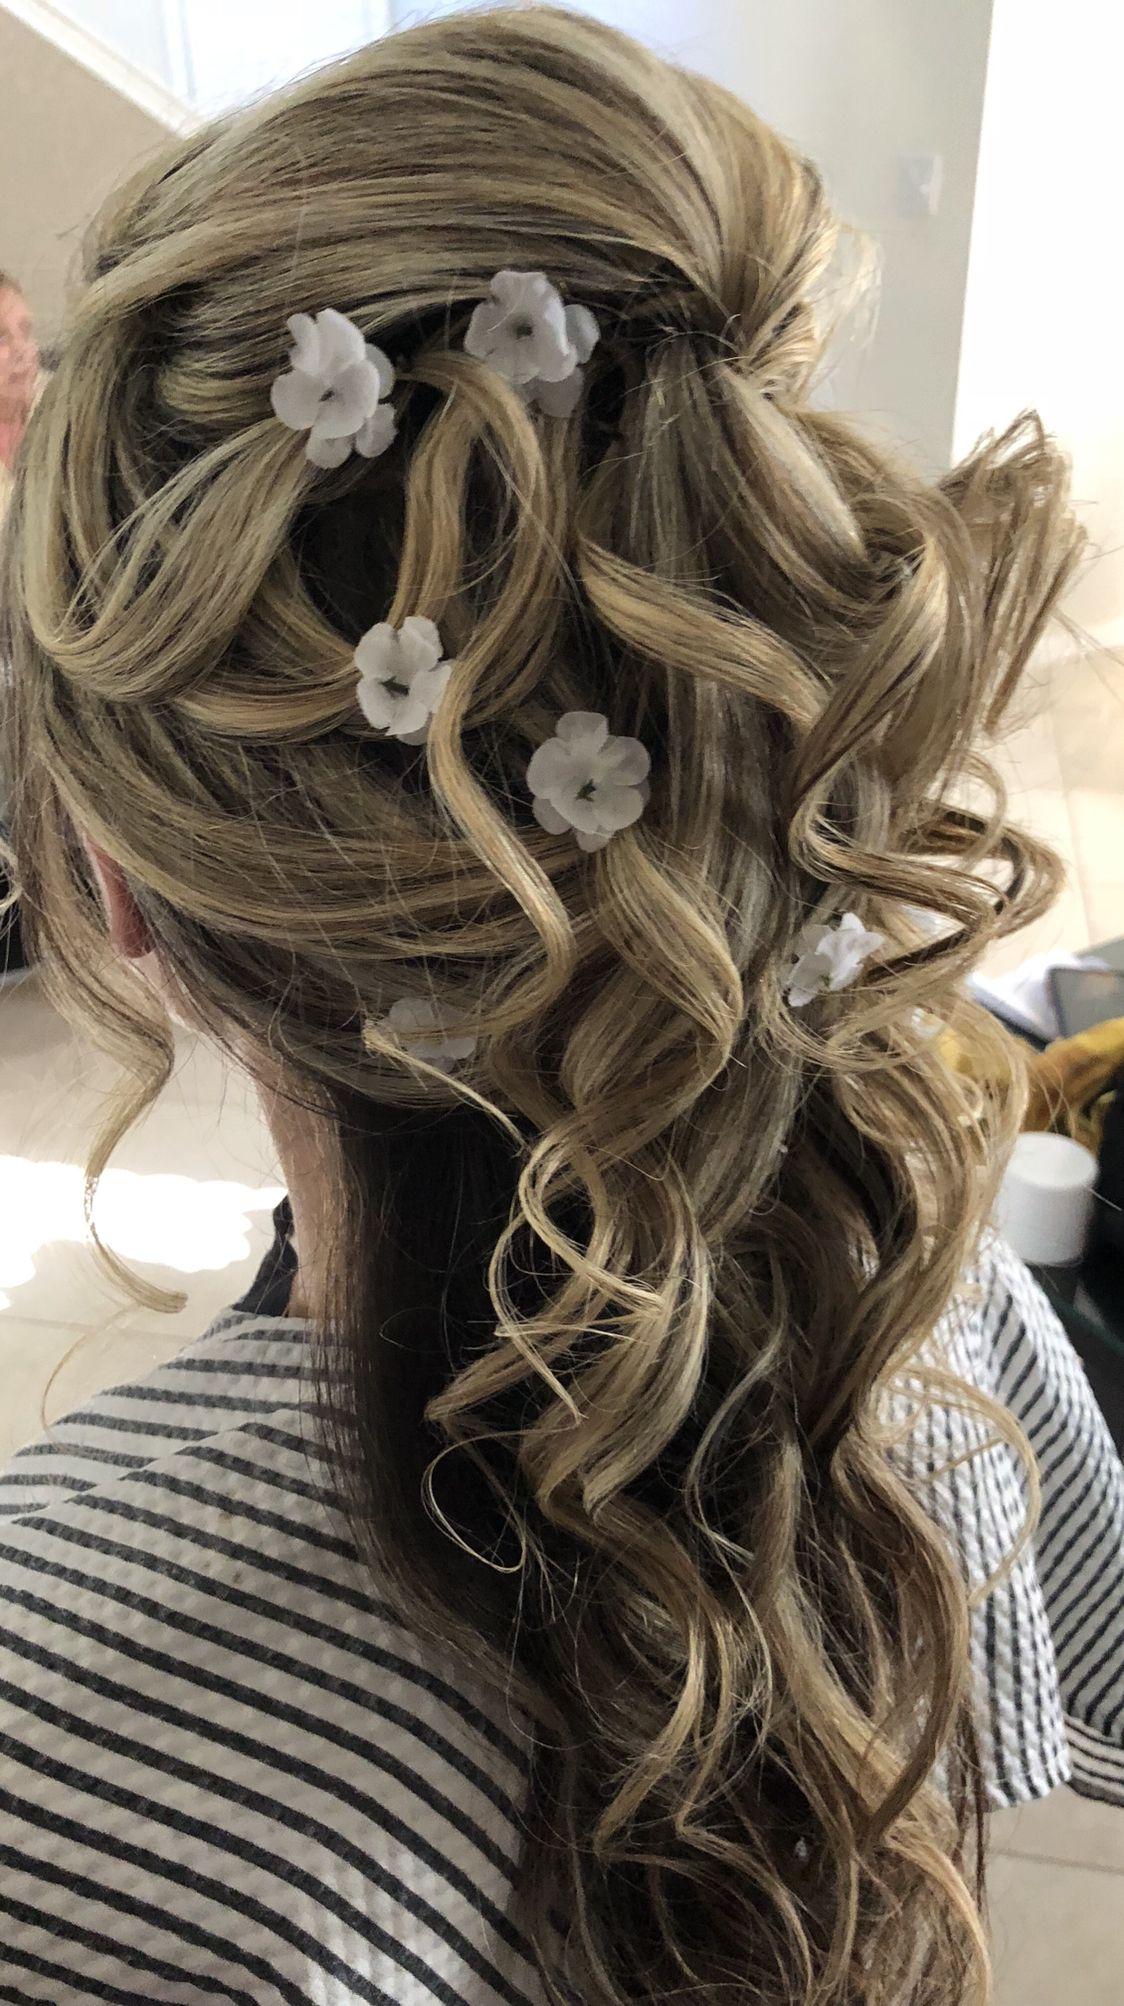 brides hair & makeup by lara - team bride 💄 davenport